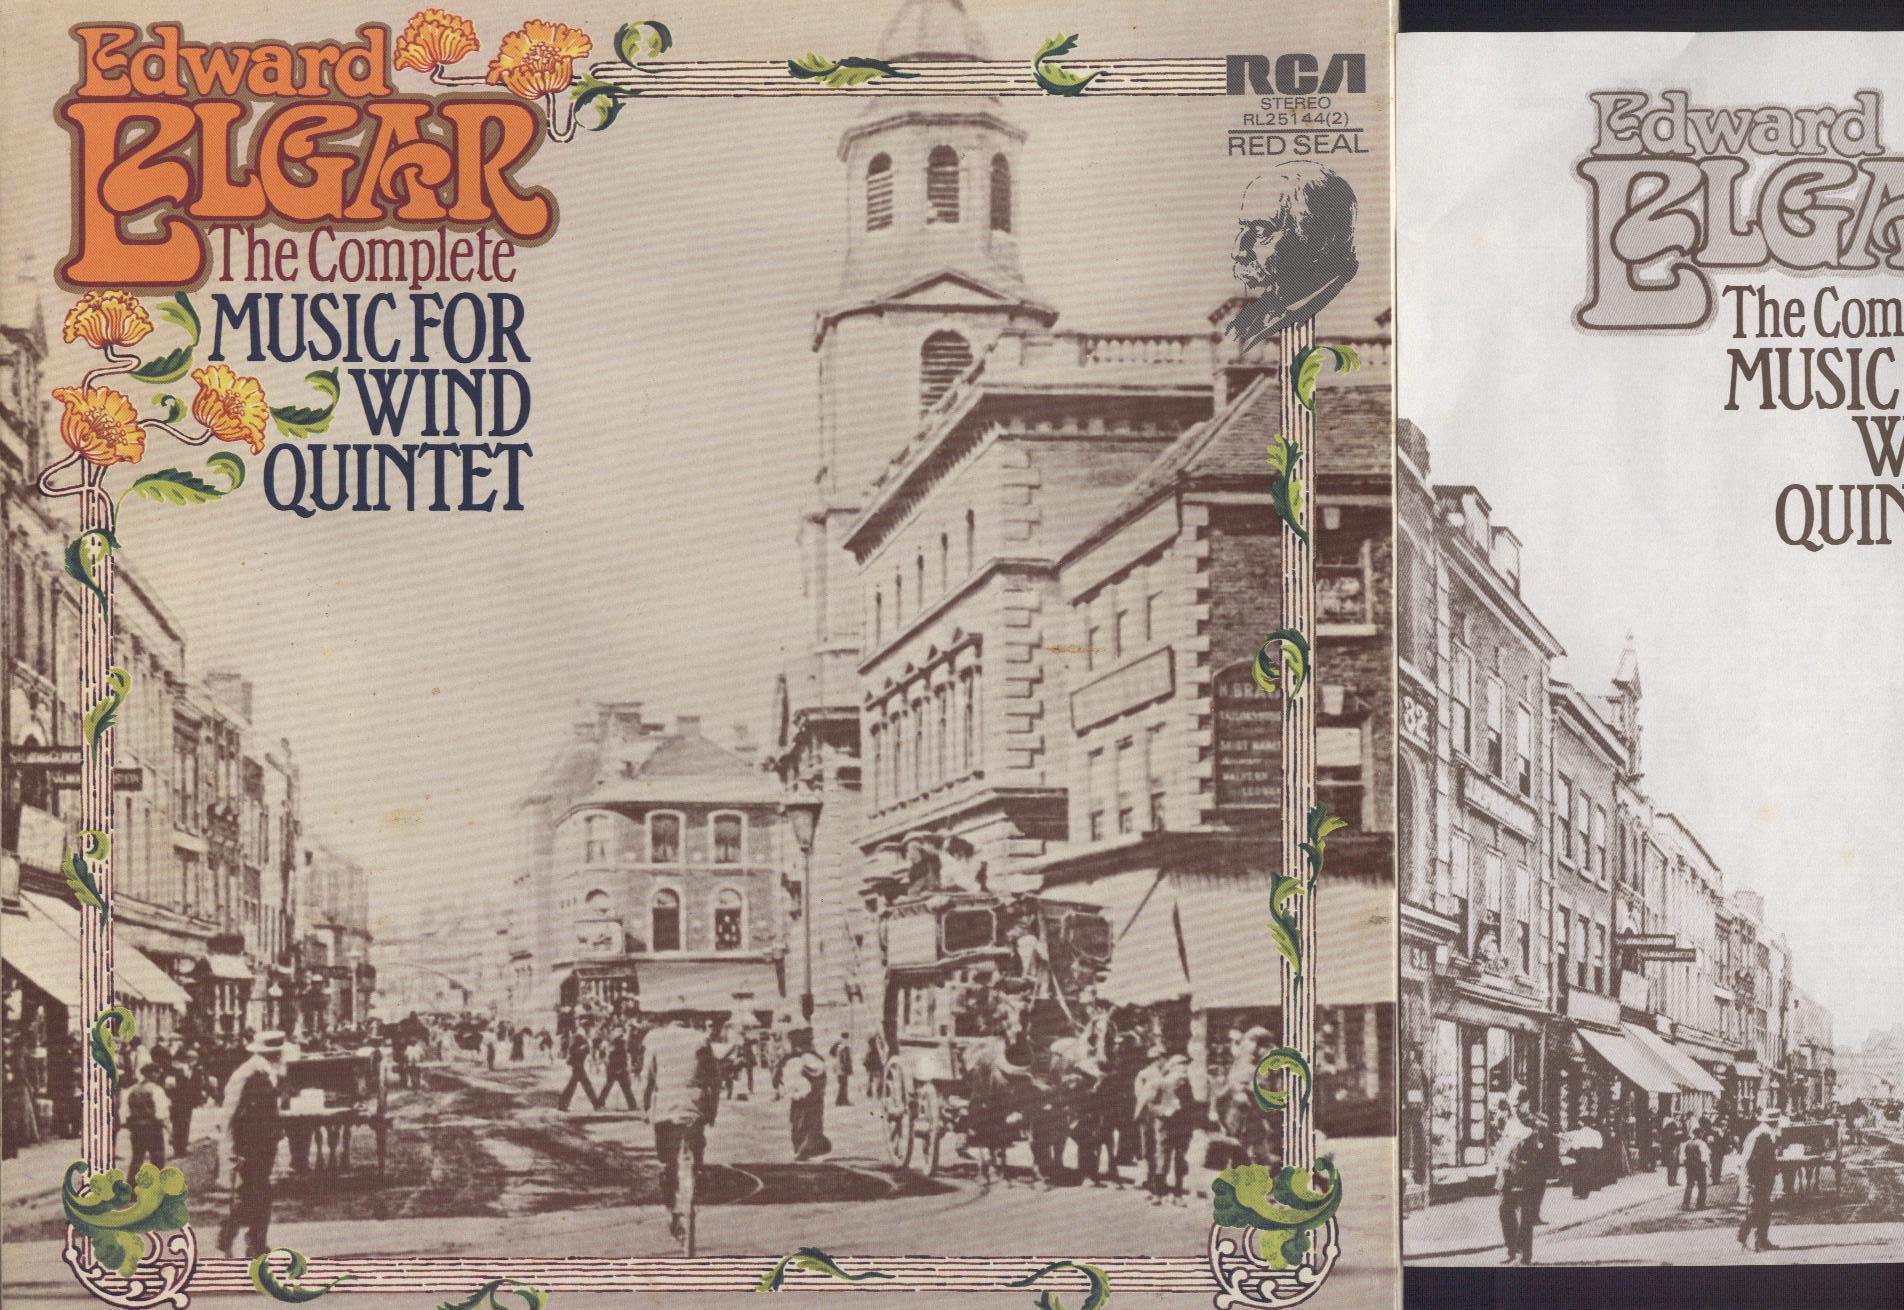 Sir Edward Elgar, Athena Ensemble - Music For Wind Quintet - LP Box Set